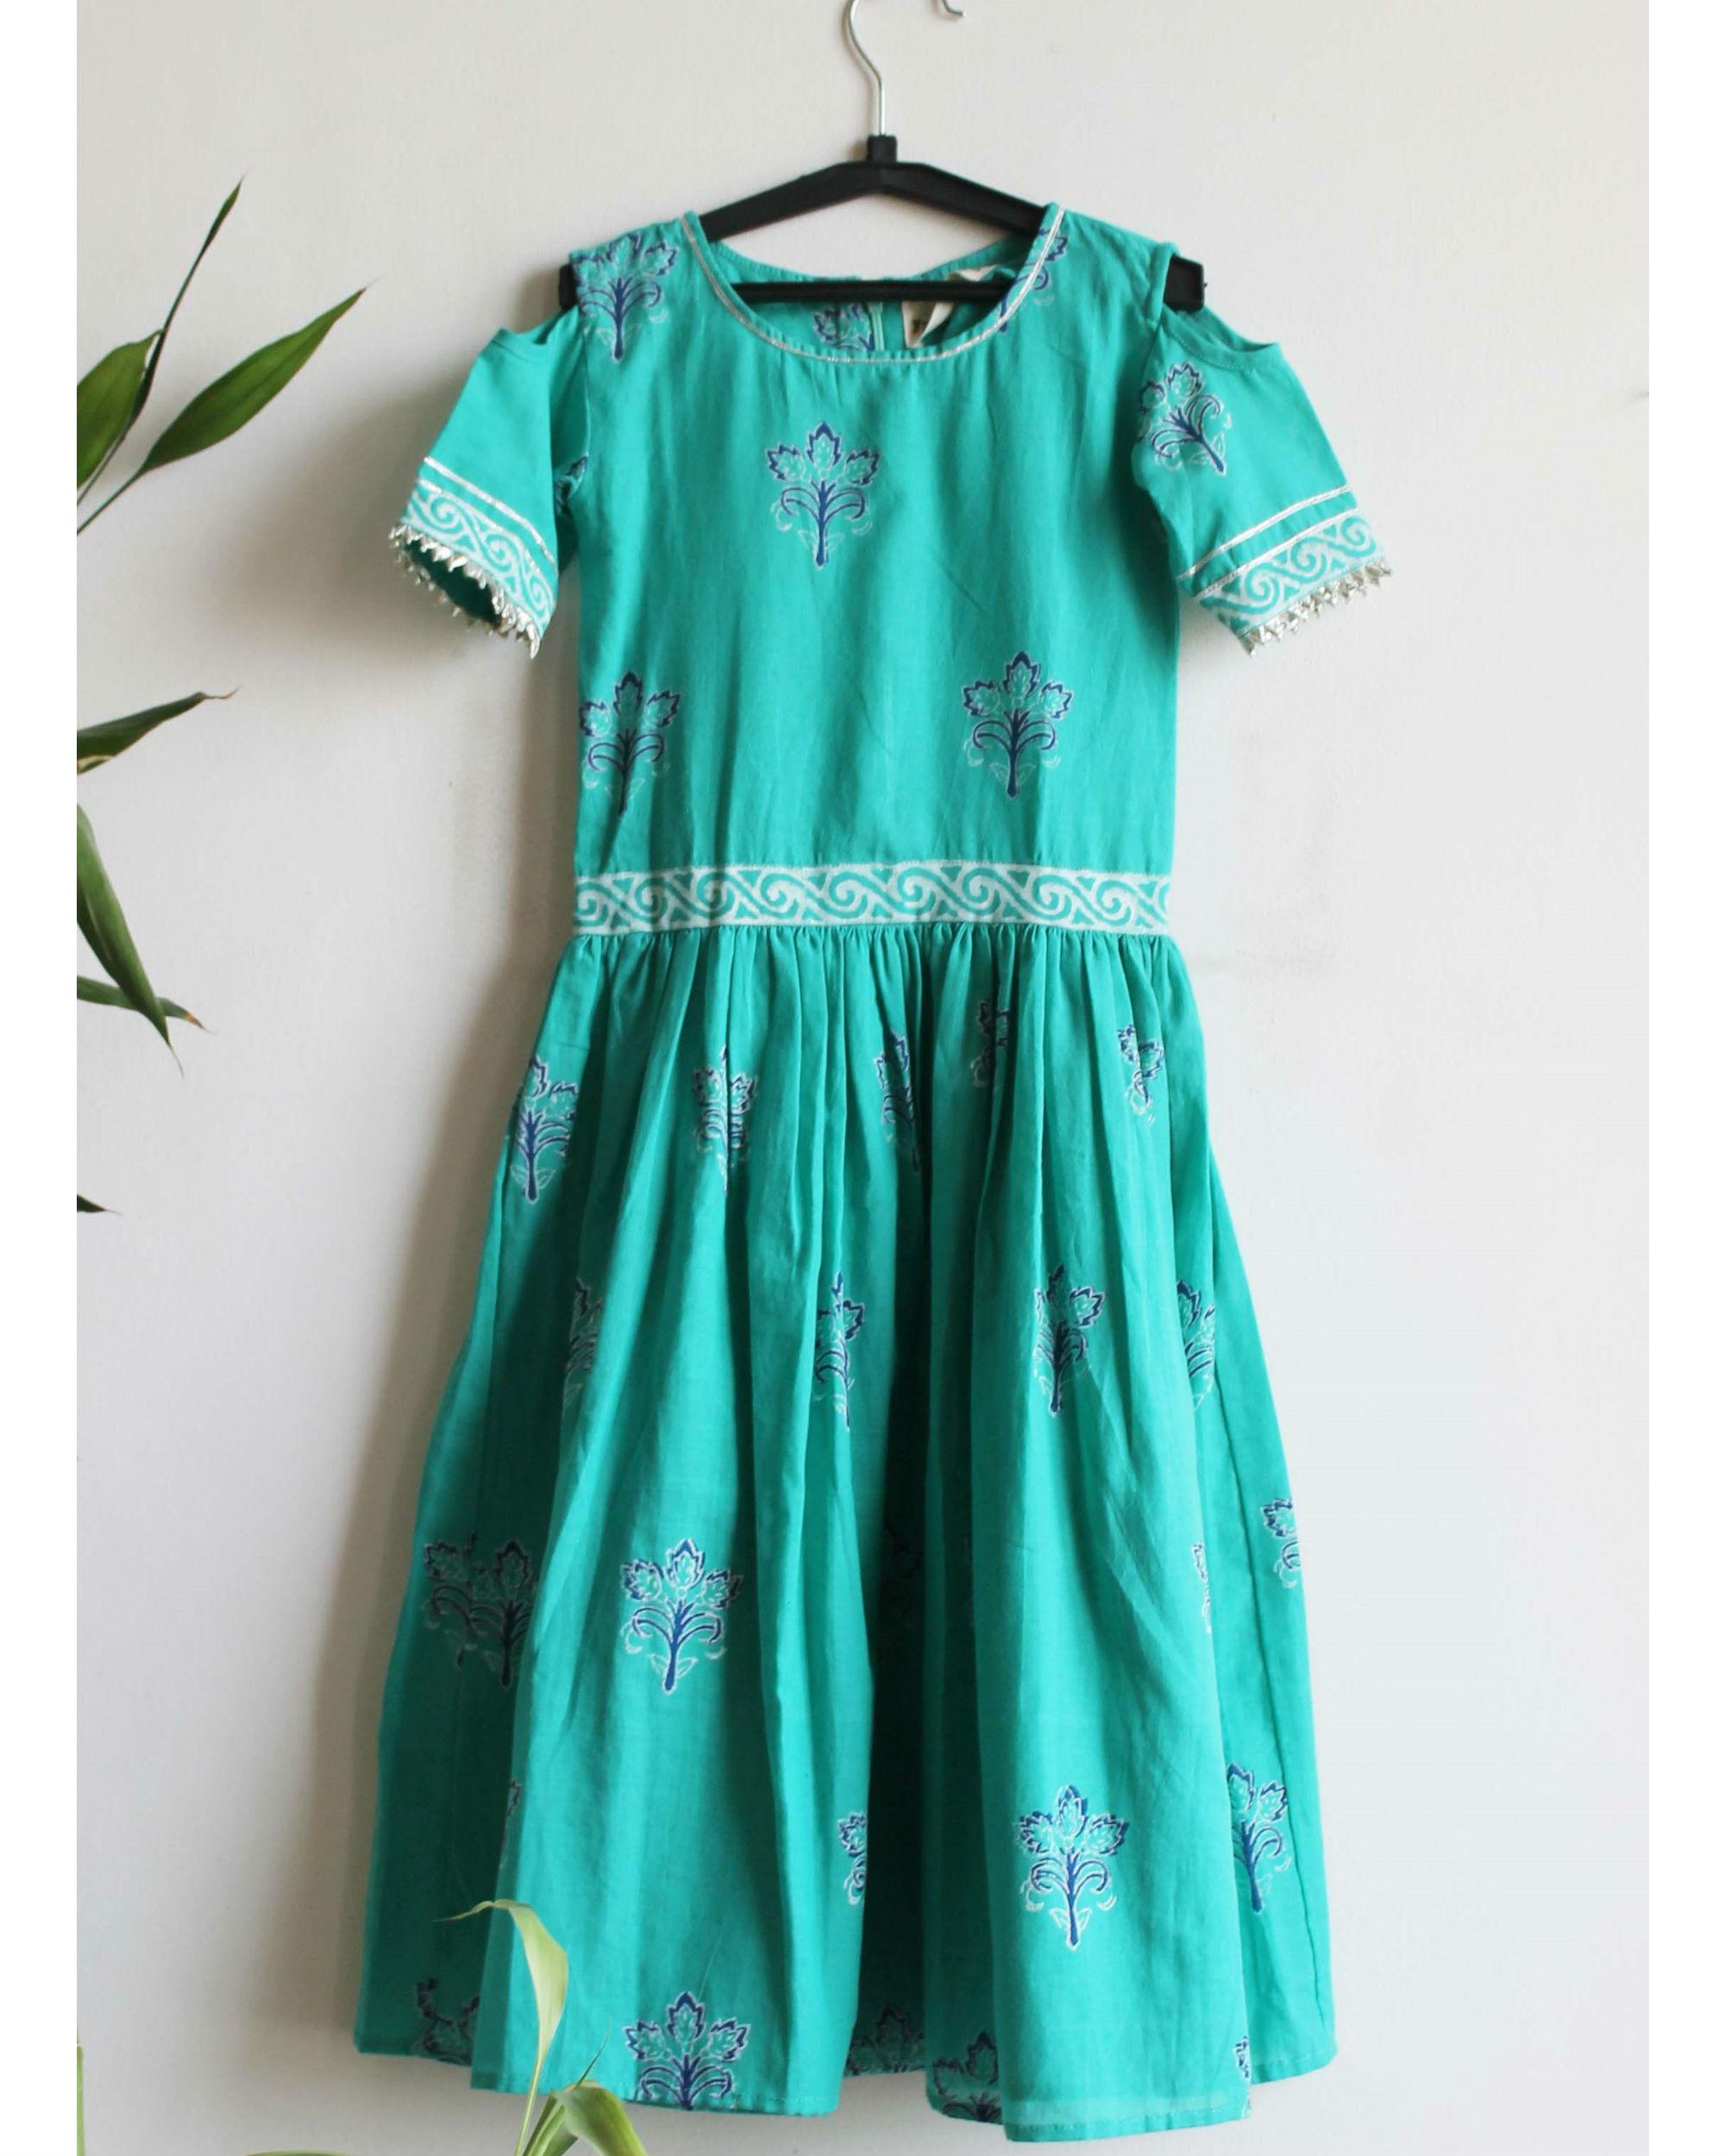 Blue lily dress